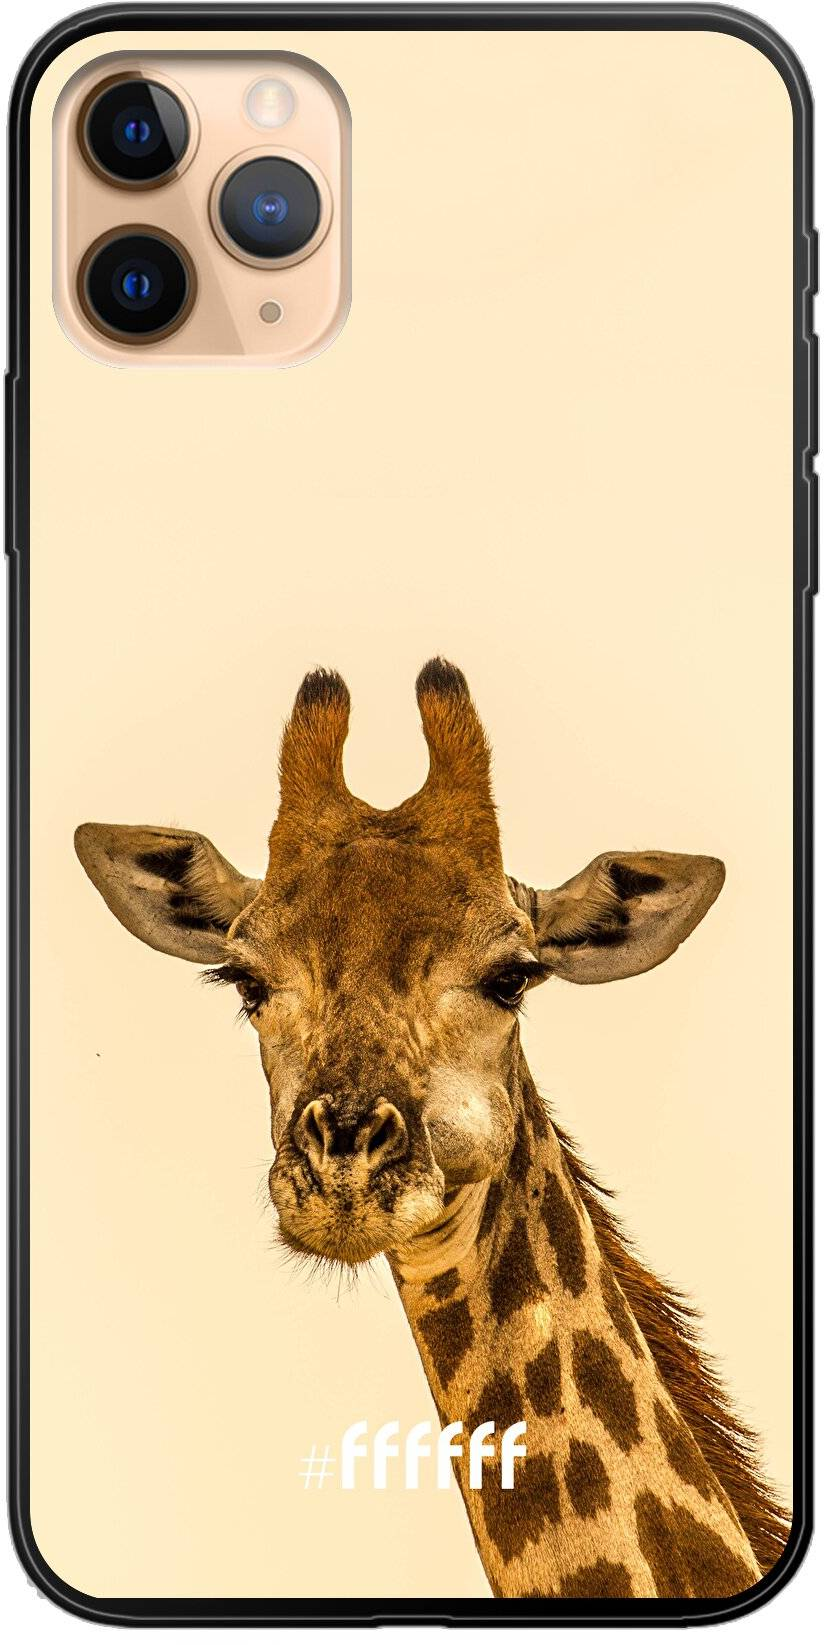 Giraffe iPhone 11 Pro Max